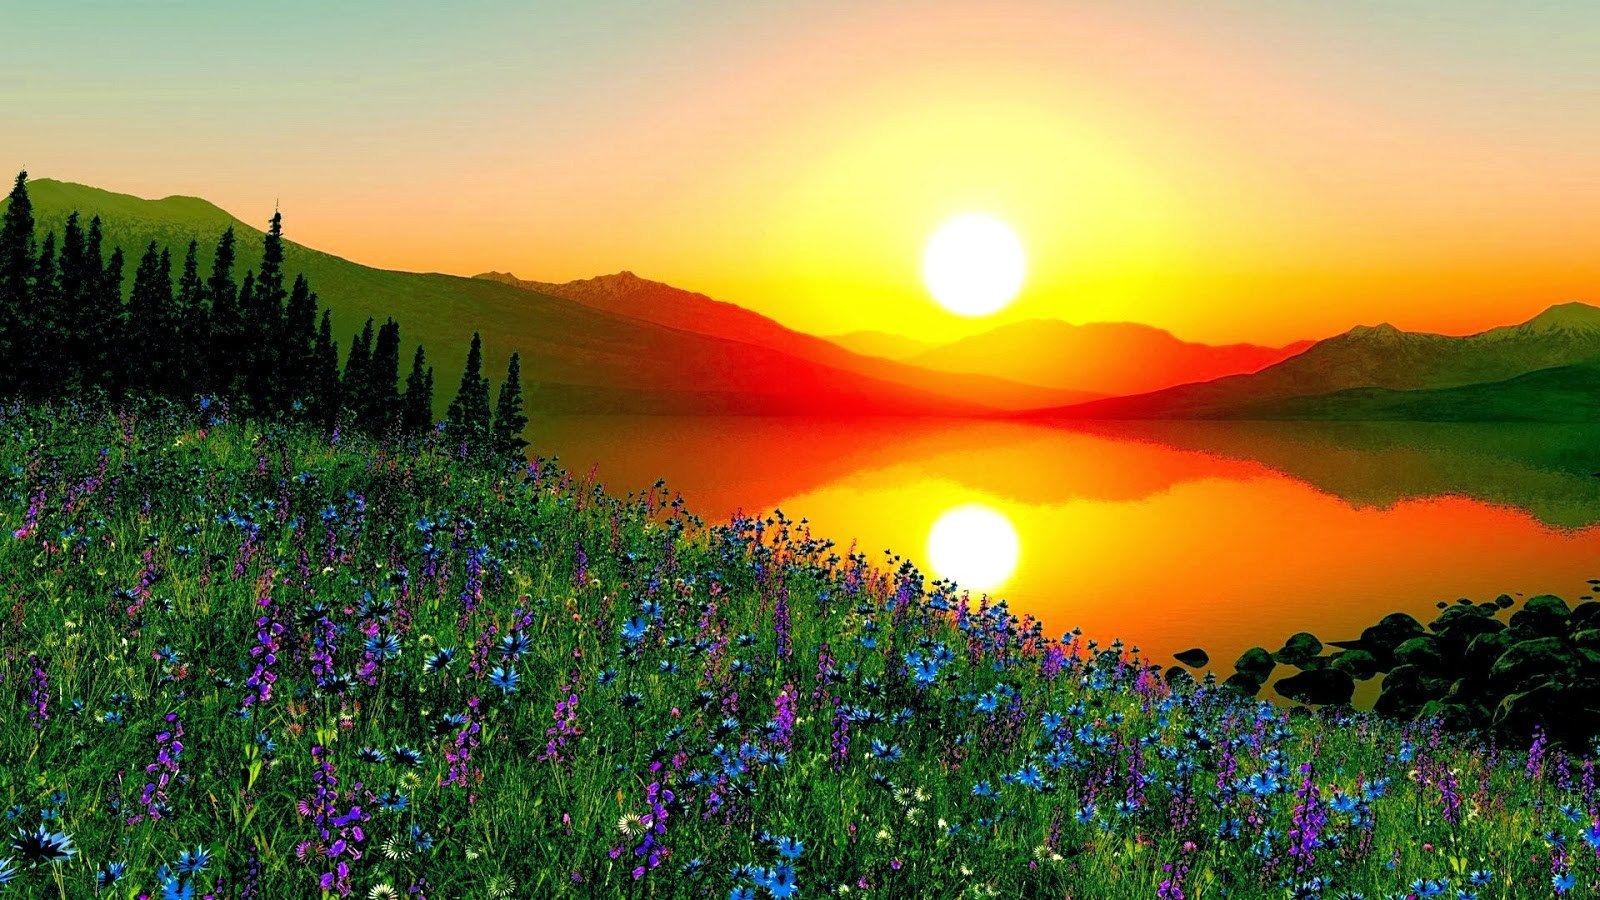 A Corner Of The Beauty Of Nature Sunrise Wallpaper Sunrise Beautiful Sunrise